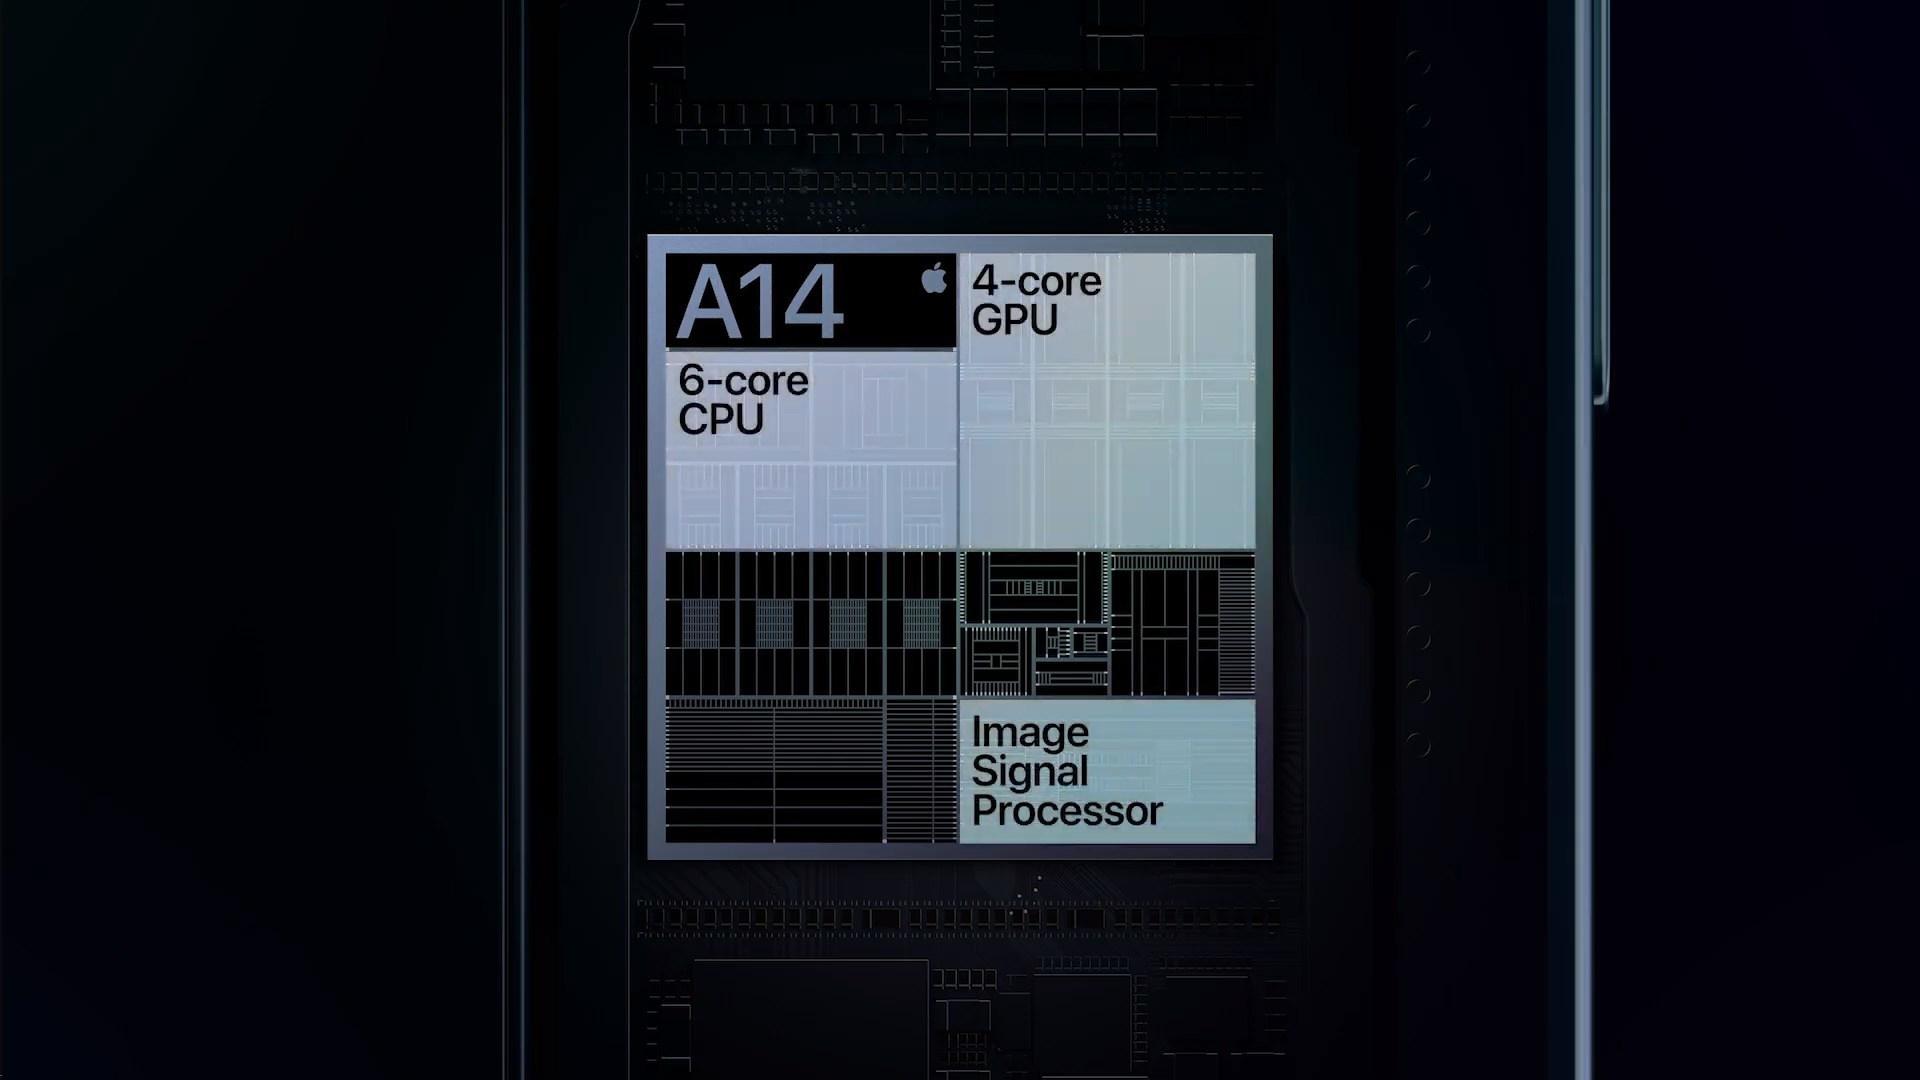 Cpu, Hardware, iPhone 12, Apple A14 Bionic